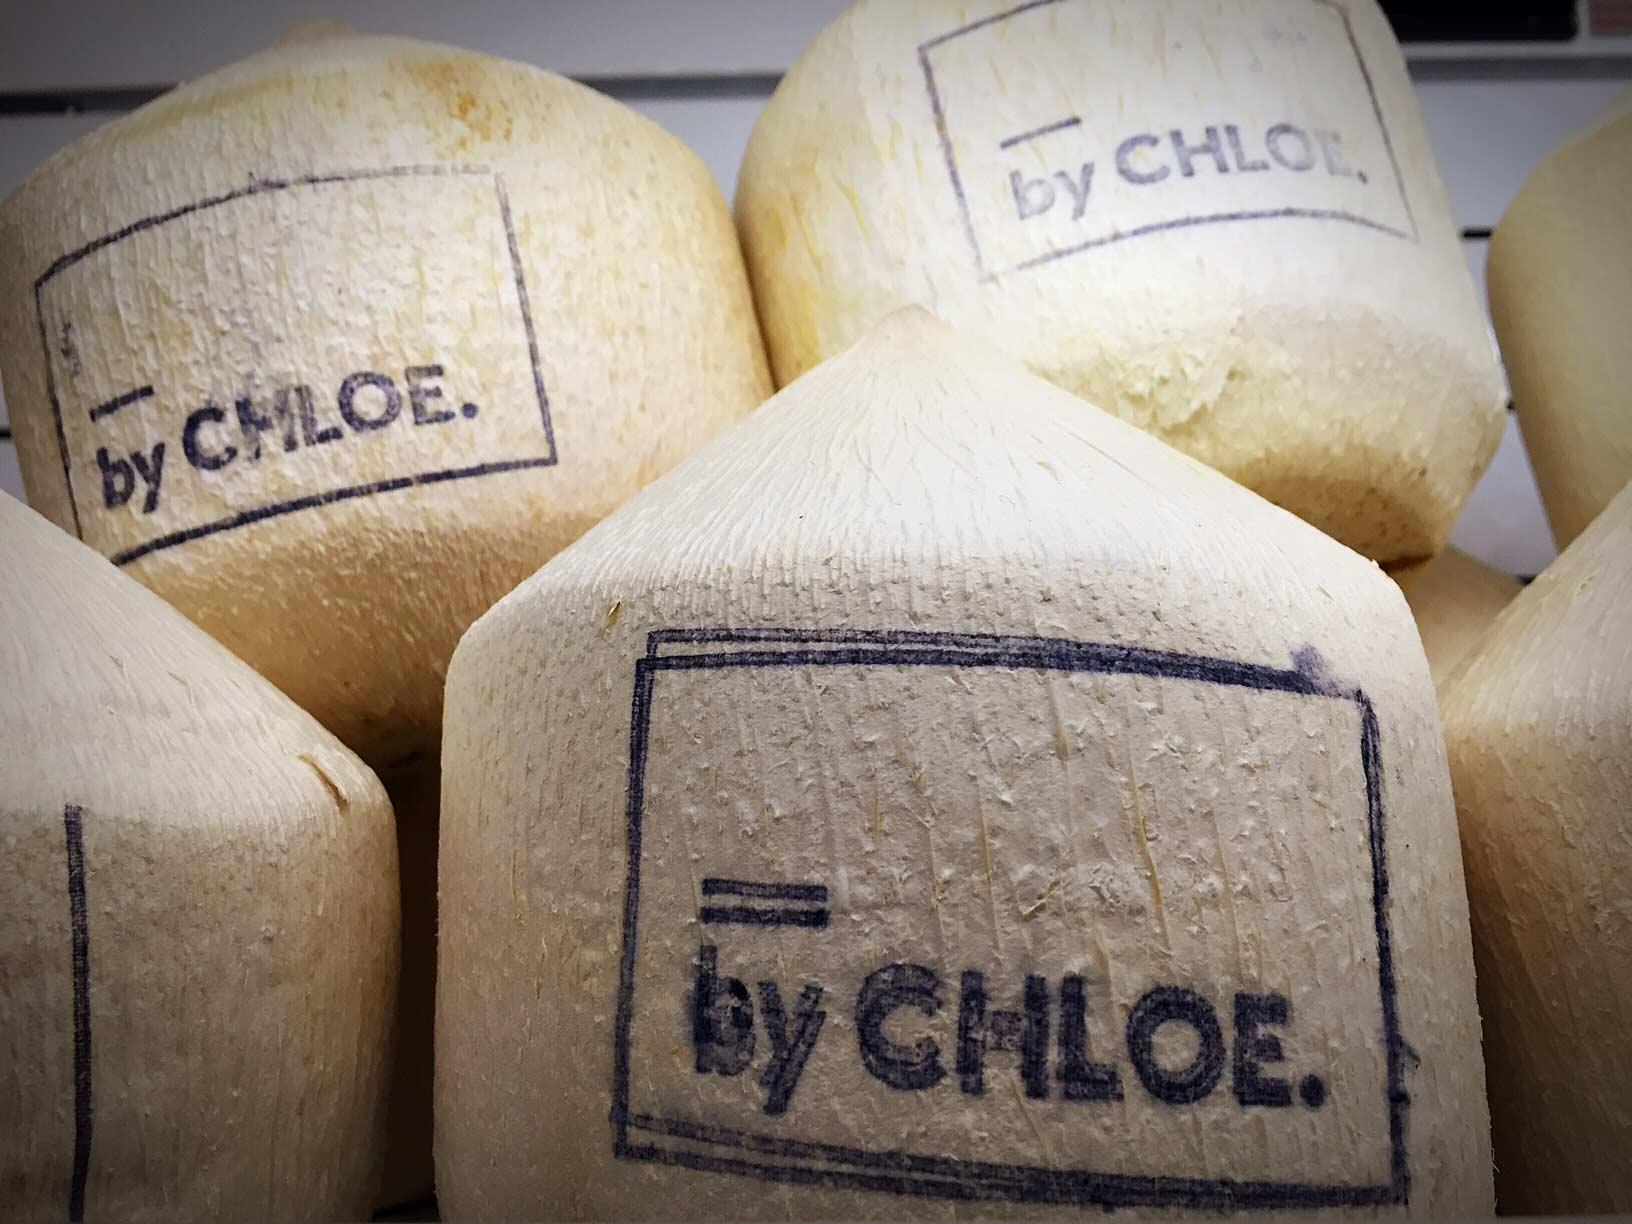 Branded coconuts.Image via  @lweatherbee